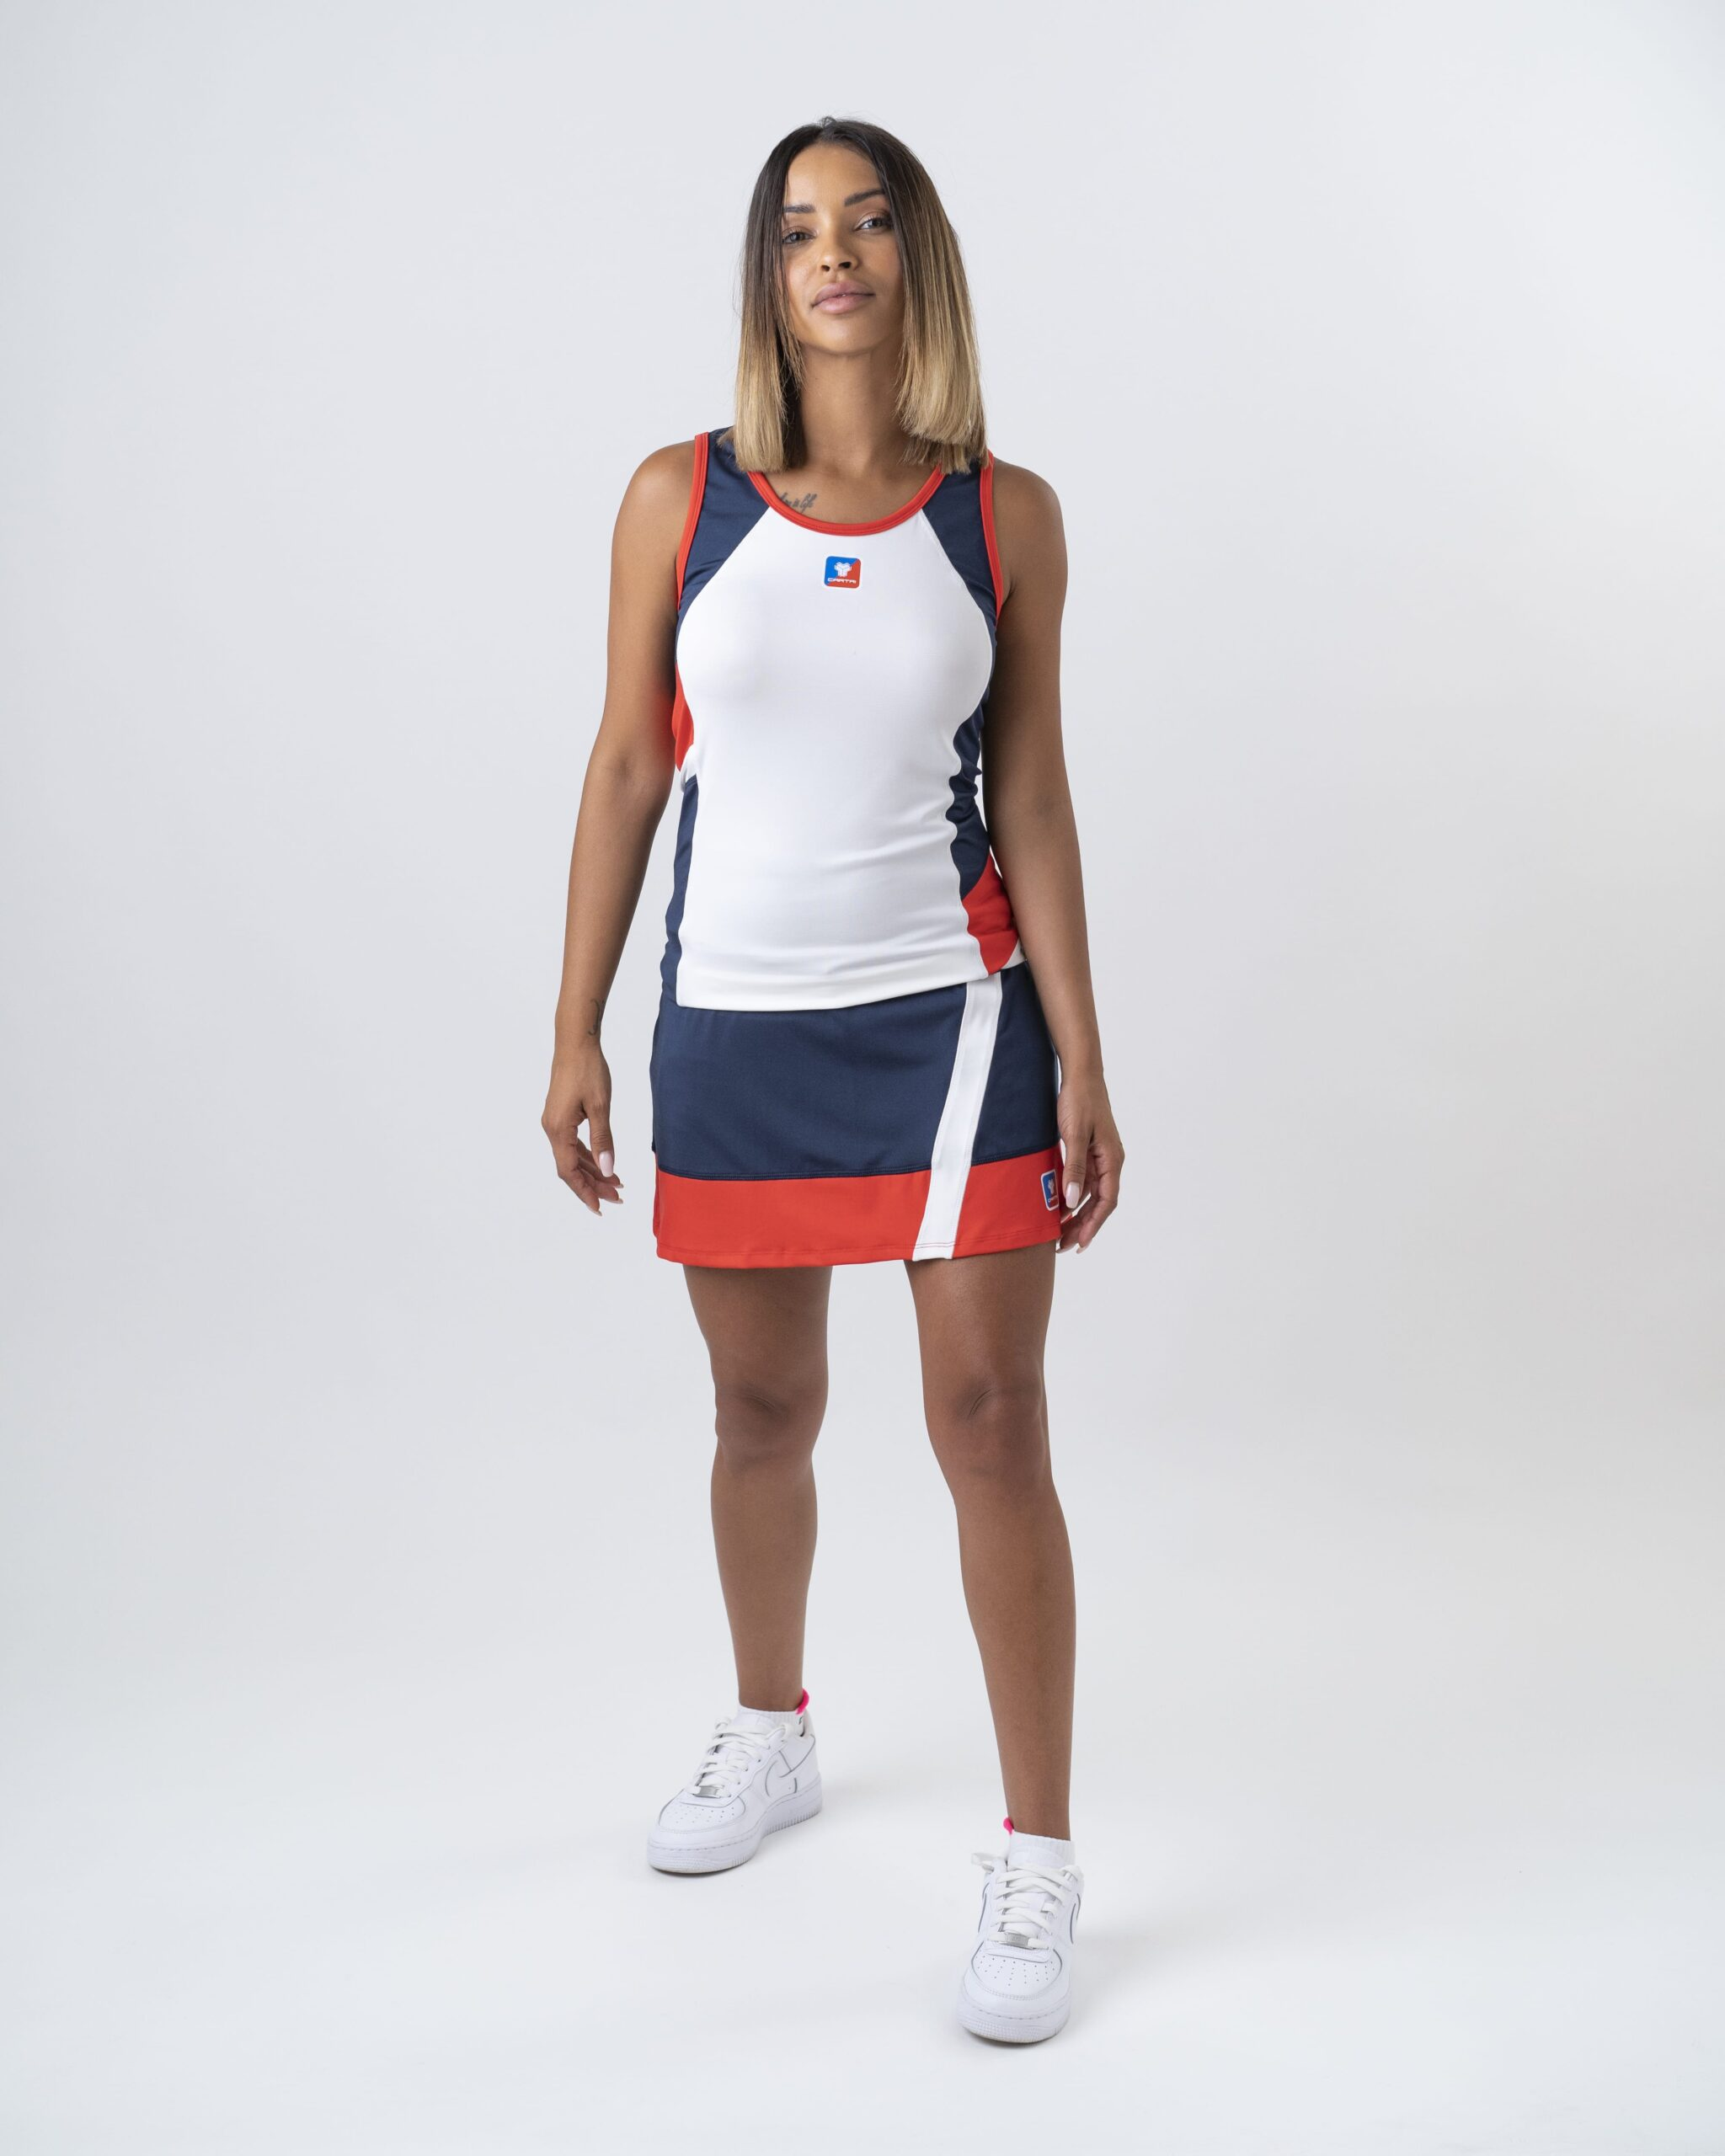 Tシャツオビドスカルトリ女性2021年